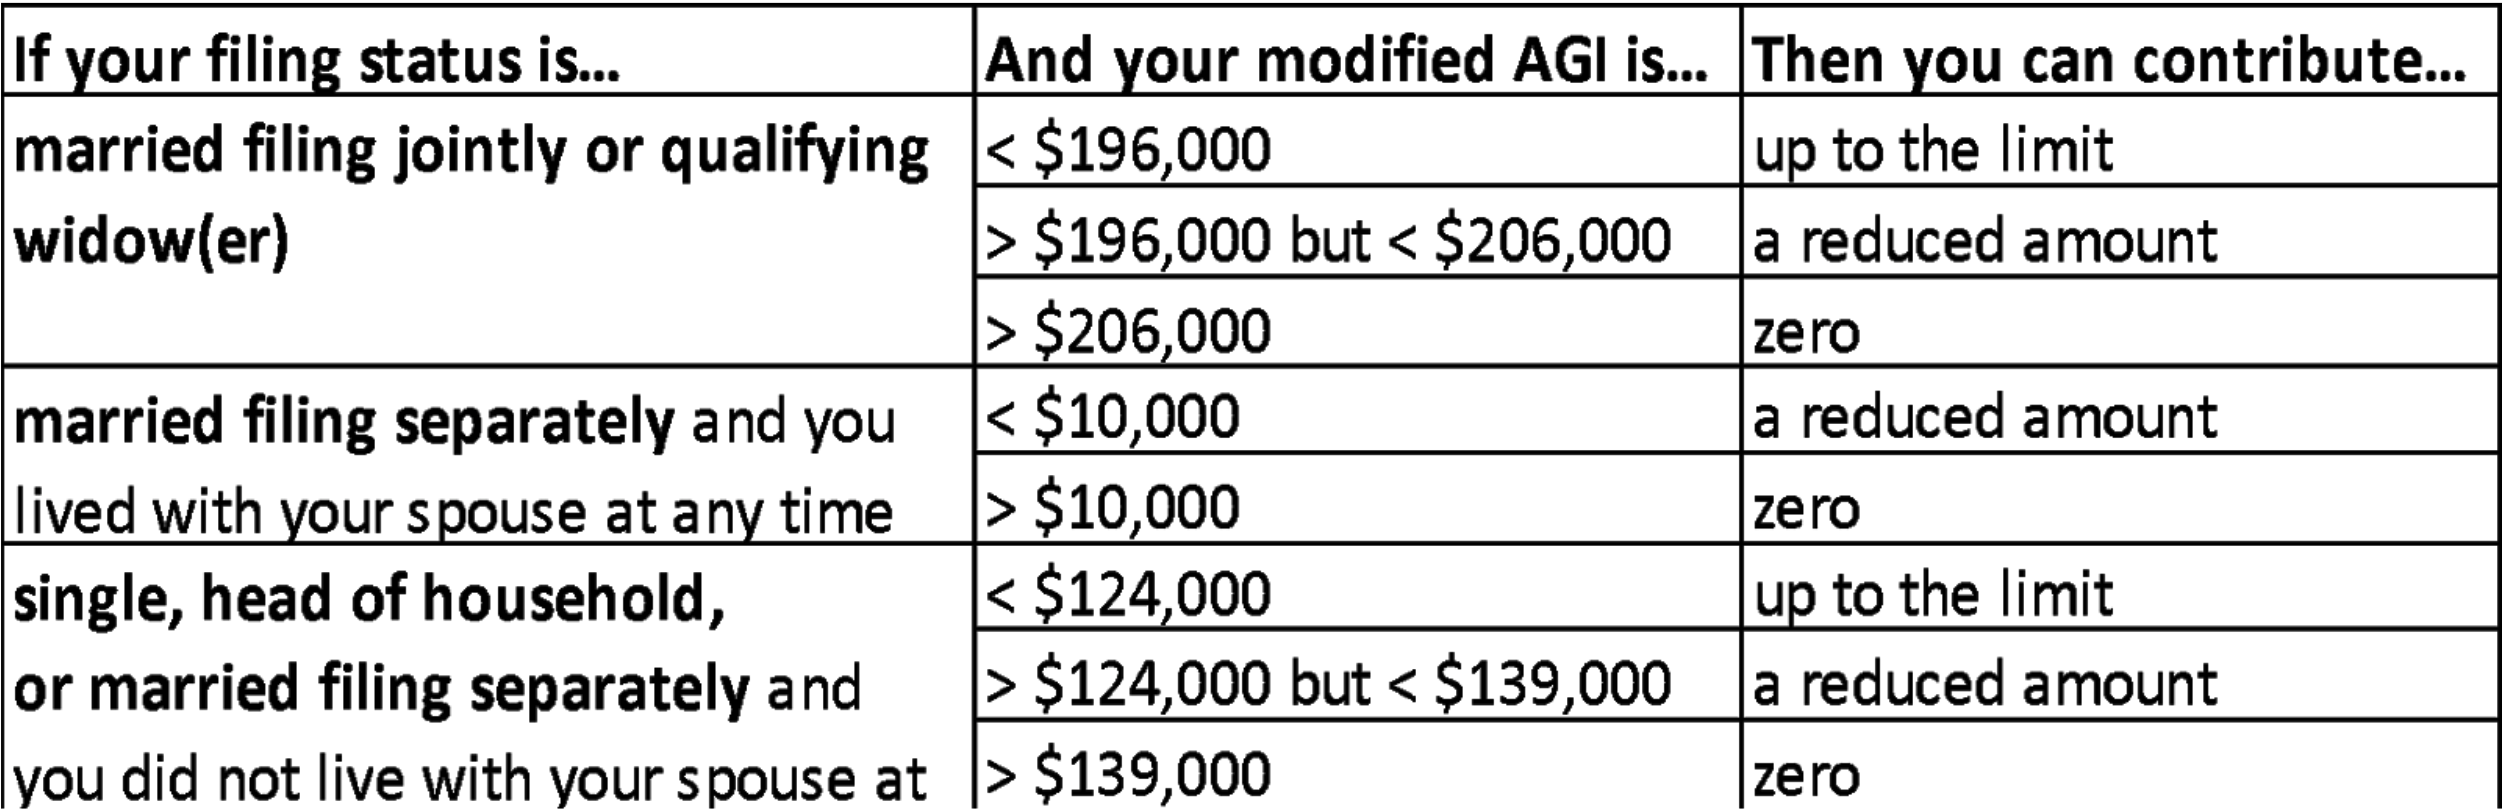 IRS Contribution Limits